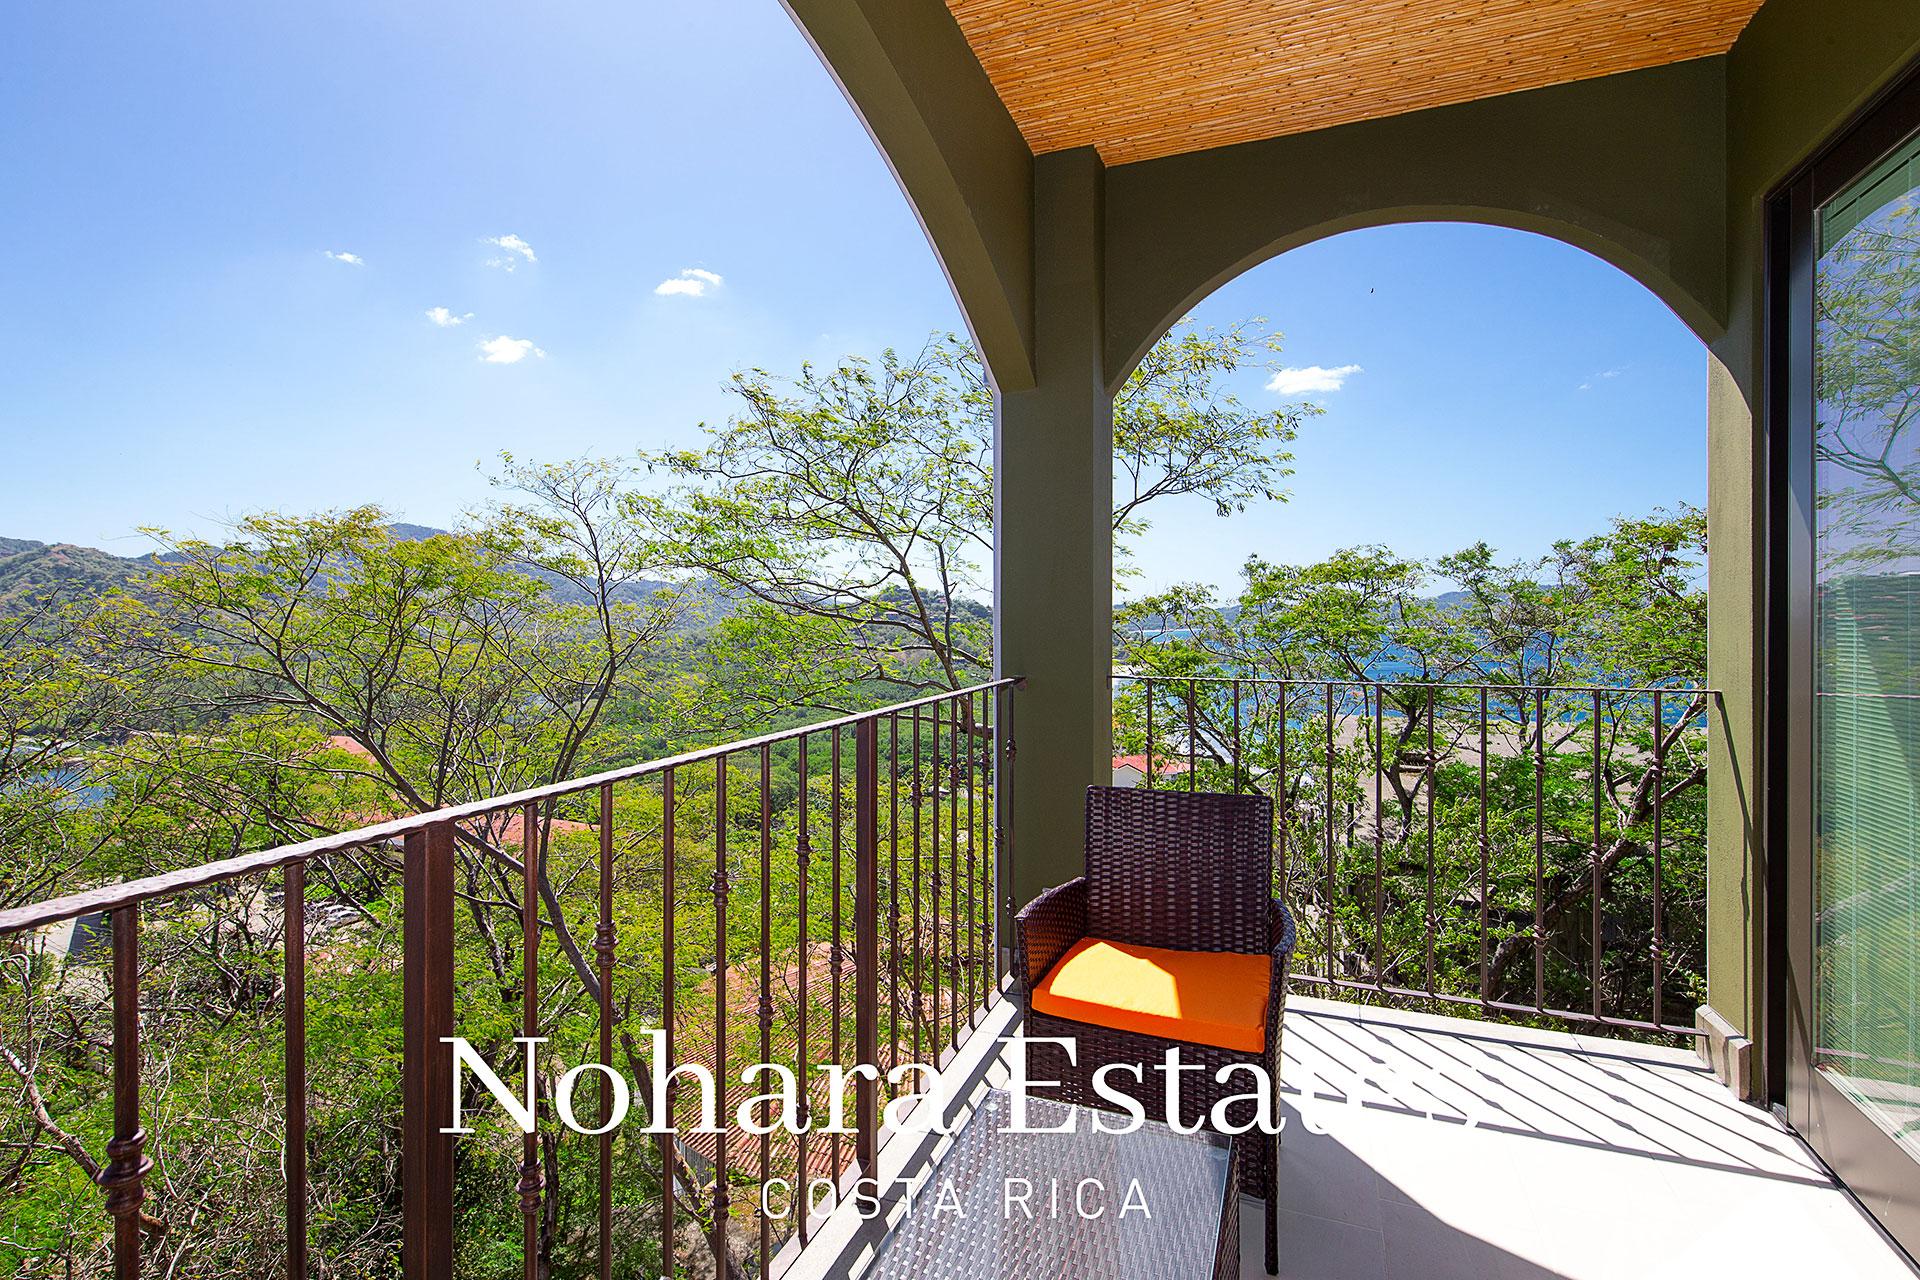 Nohara Estates Costa Rica 360 Esplendor Del Pacifico 101 3